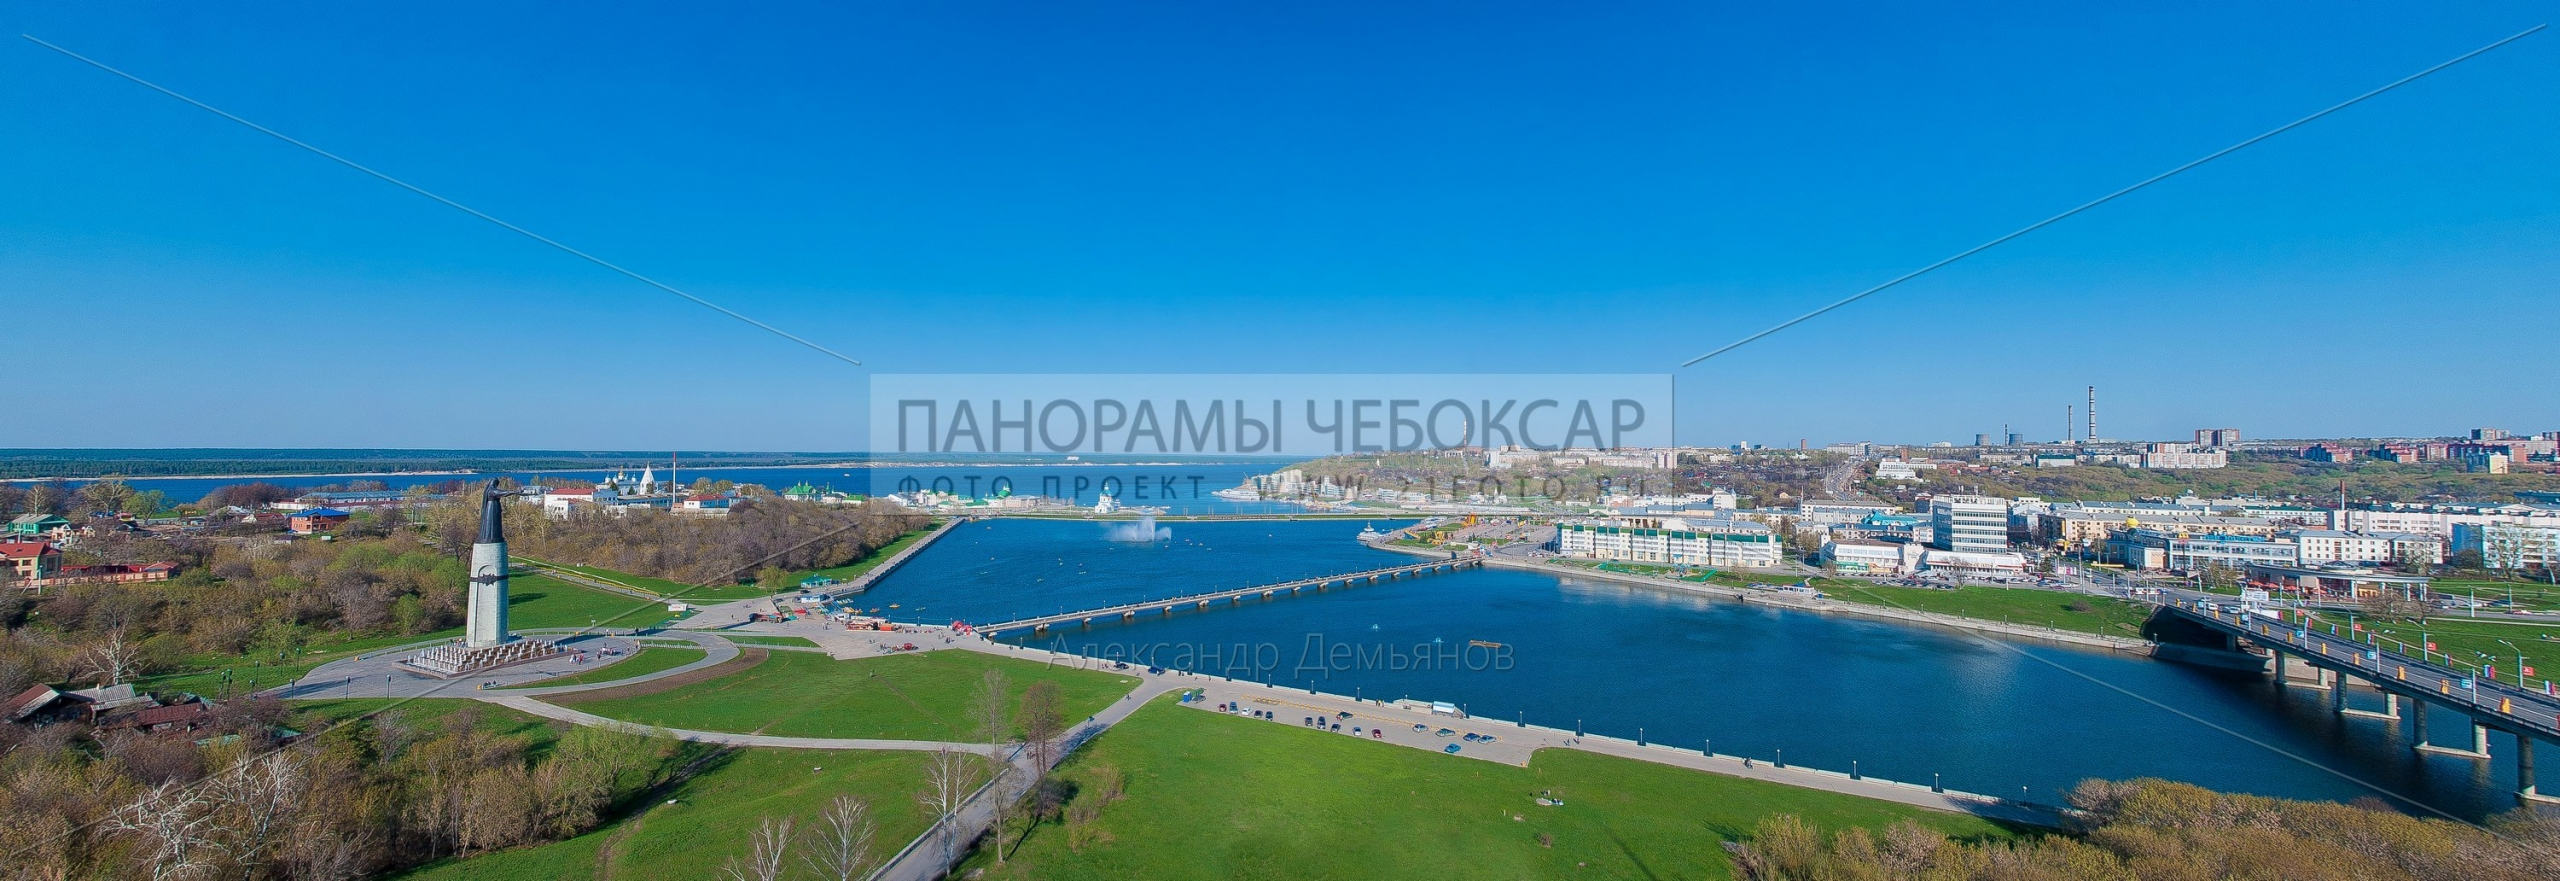 Фото панорама Чебоксарского Залива Летом